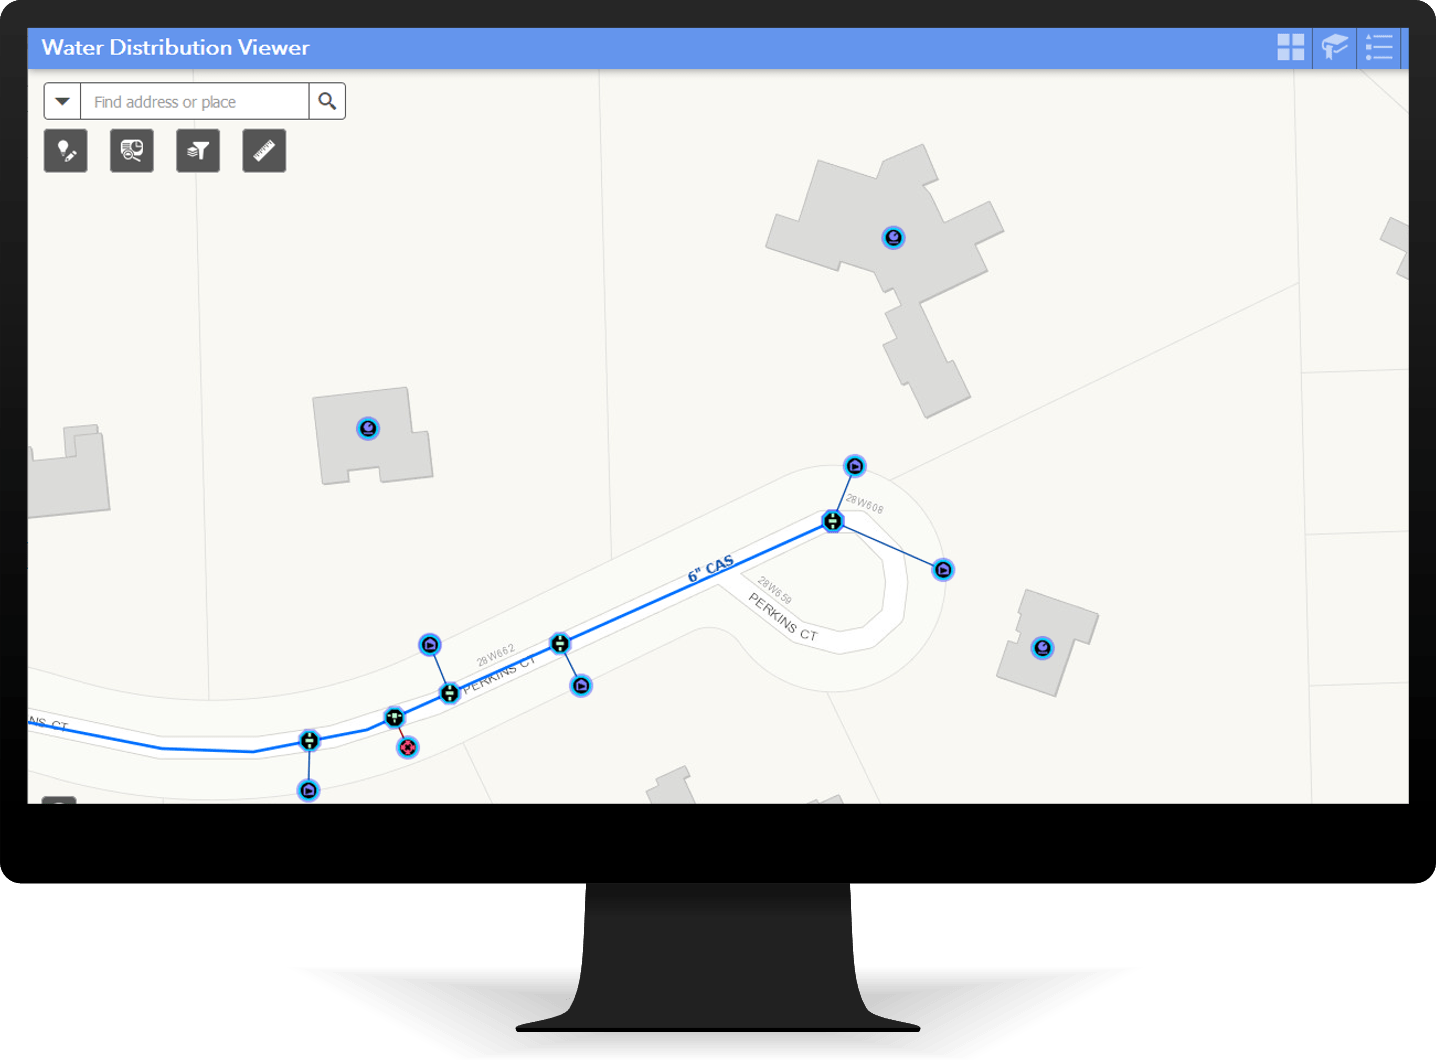 Water Distribution Viewer